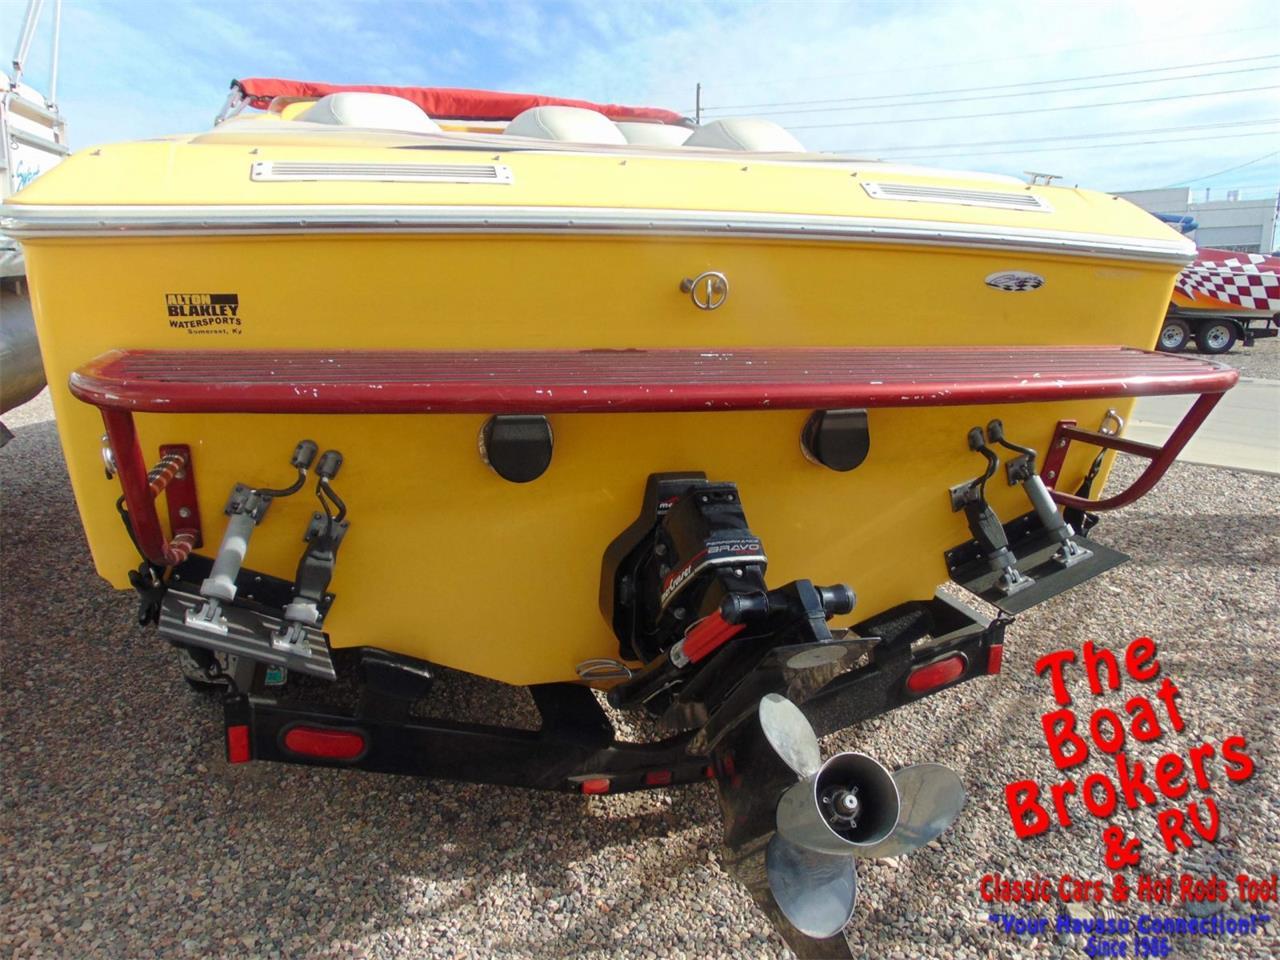 1999 Miscellaneous Boat (CC-1320086) for sale in Lake Havasu, Arizona